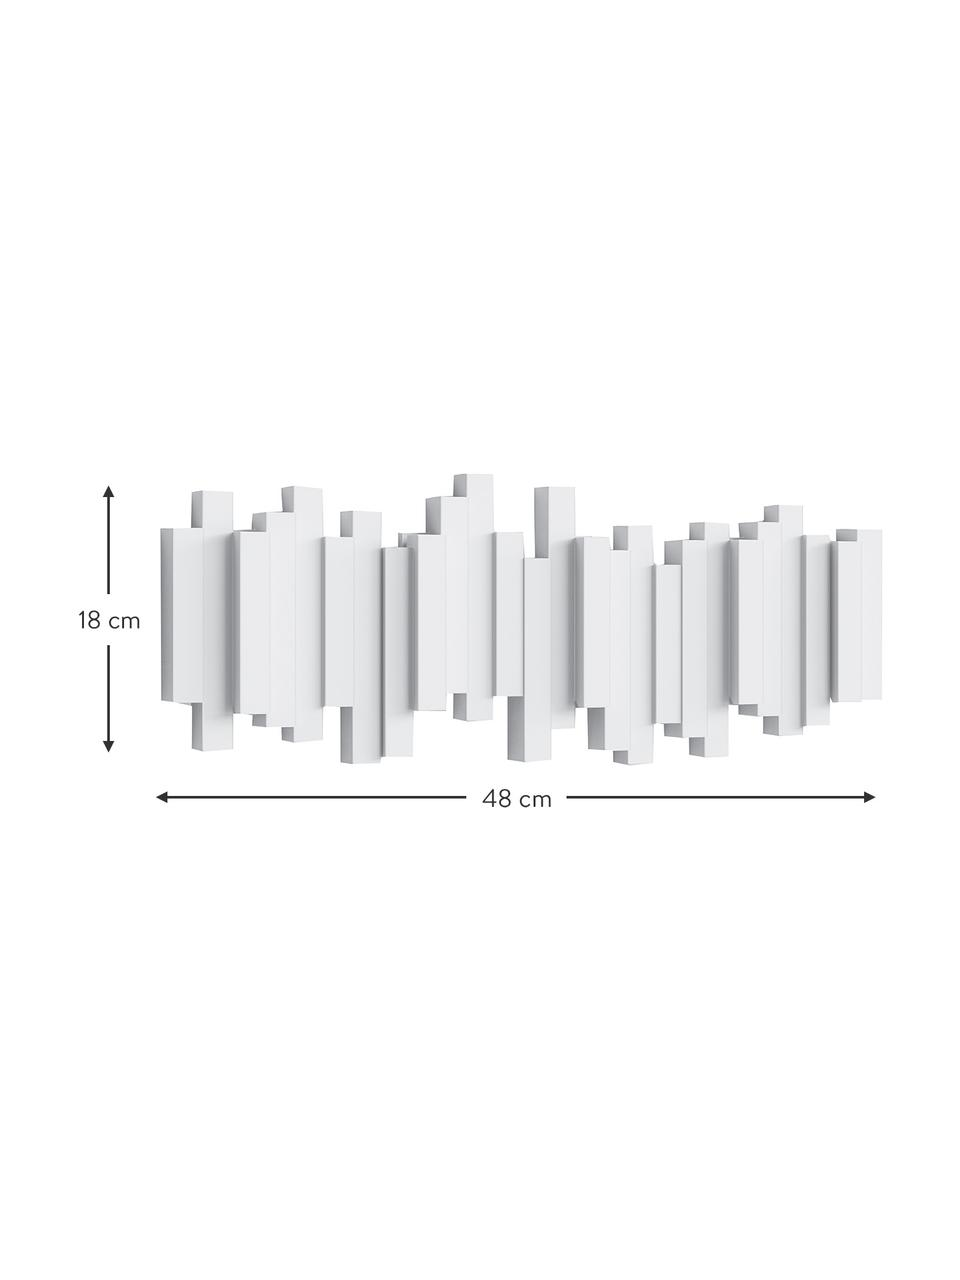 Ganci appendiabiti bianco Sticks, Materiale sintetico, Bianco, Larg. 48 x Alt. 18 cm